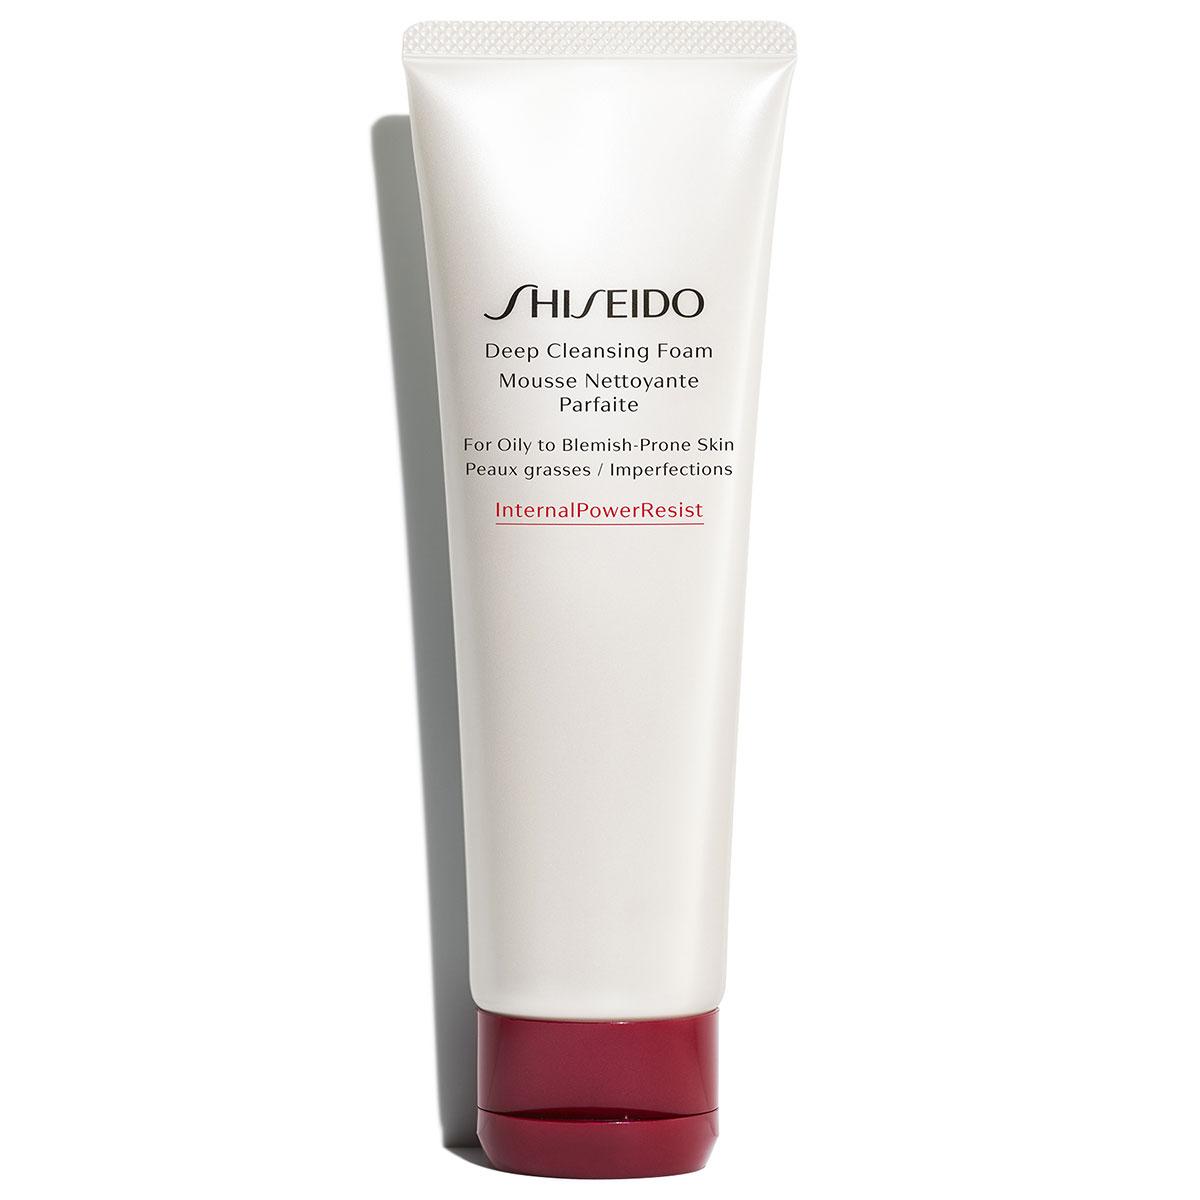 Shiseido - Mousse Nettoyante Parfaite - 125 ml